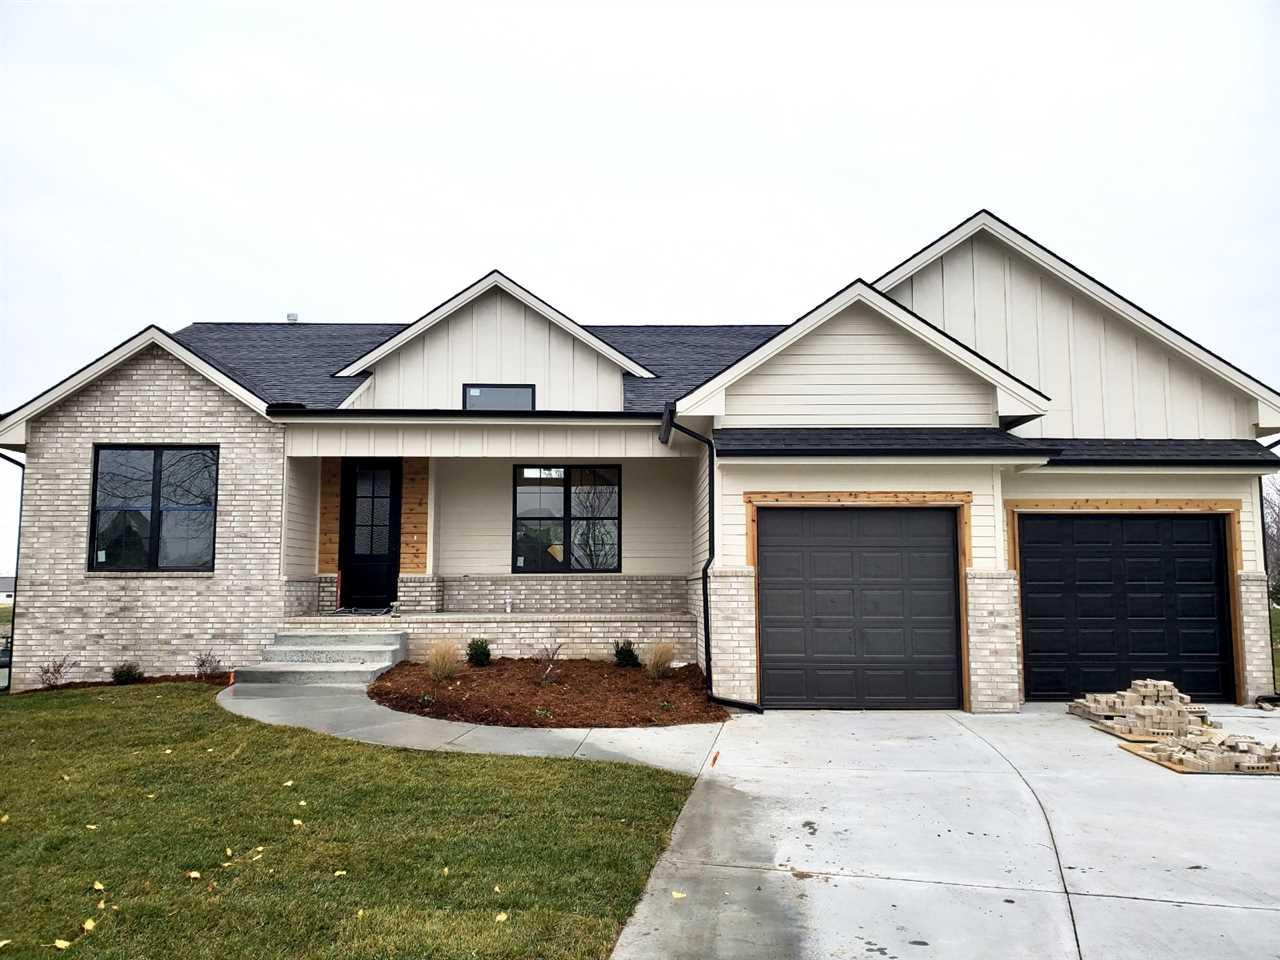 For Sale: 2505 58th Ct. N., Wichita, KS, 67204,